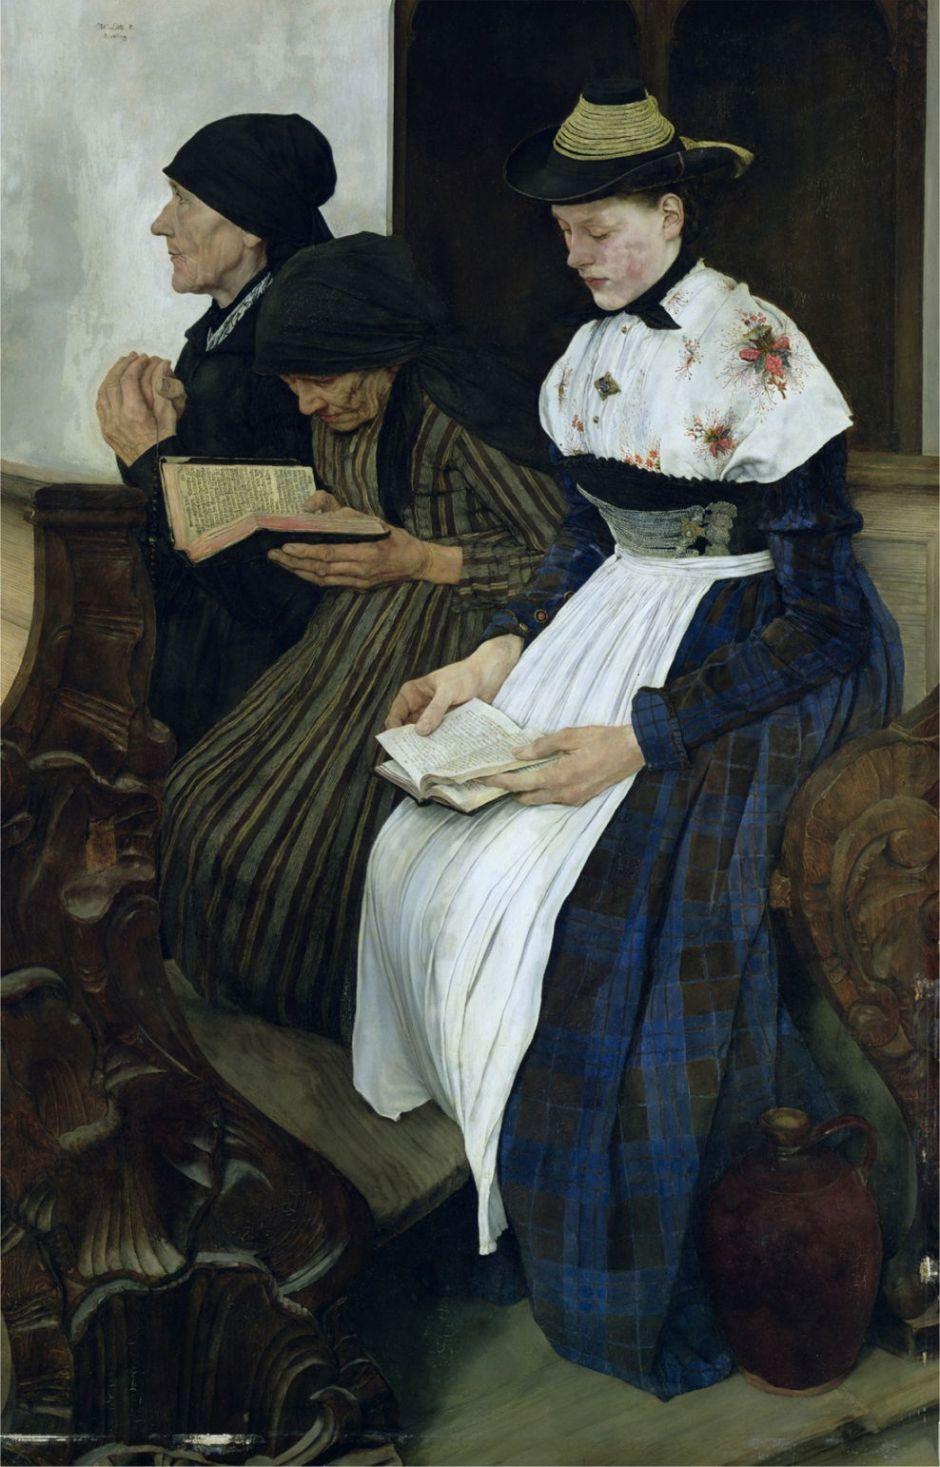 Wilhelm Leibl (1844–1900), Drei Frauen in der Kirche (Three Women in Church) (1882), oil on mahogany wood, 113 × 77 cm, Kunsthalle Hamburg, Hamburg. Wikimedia Commons.